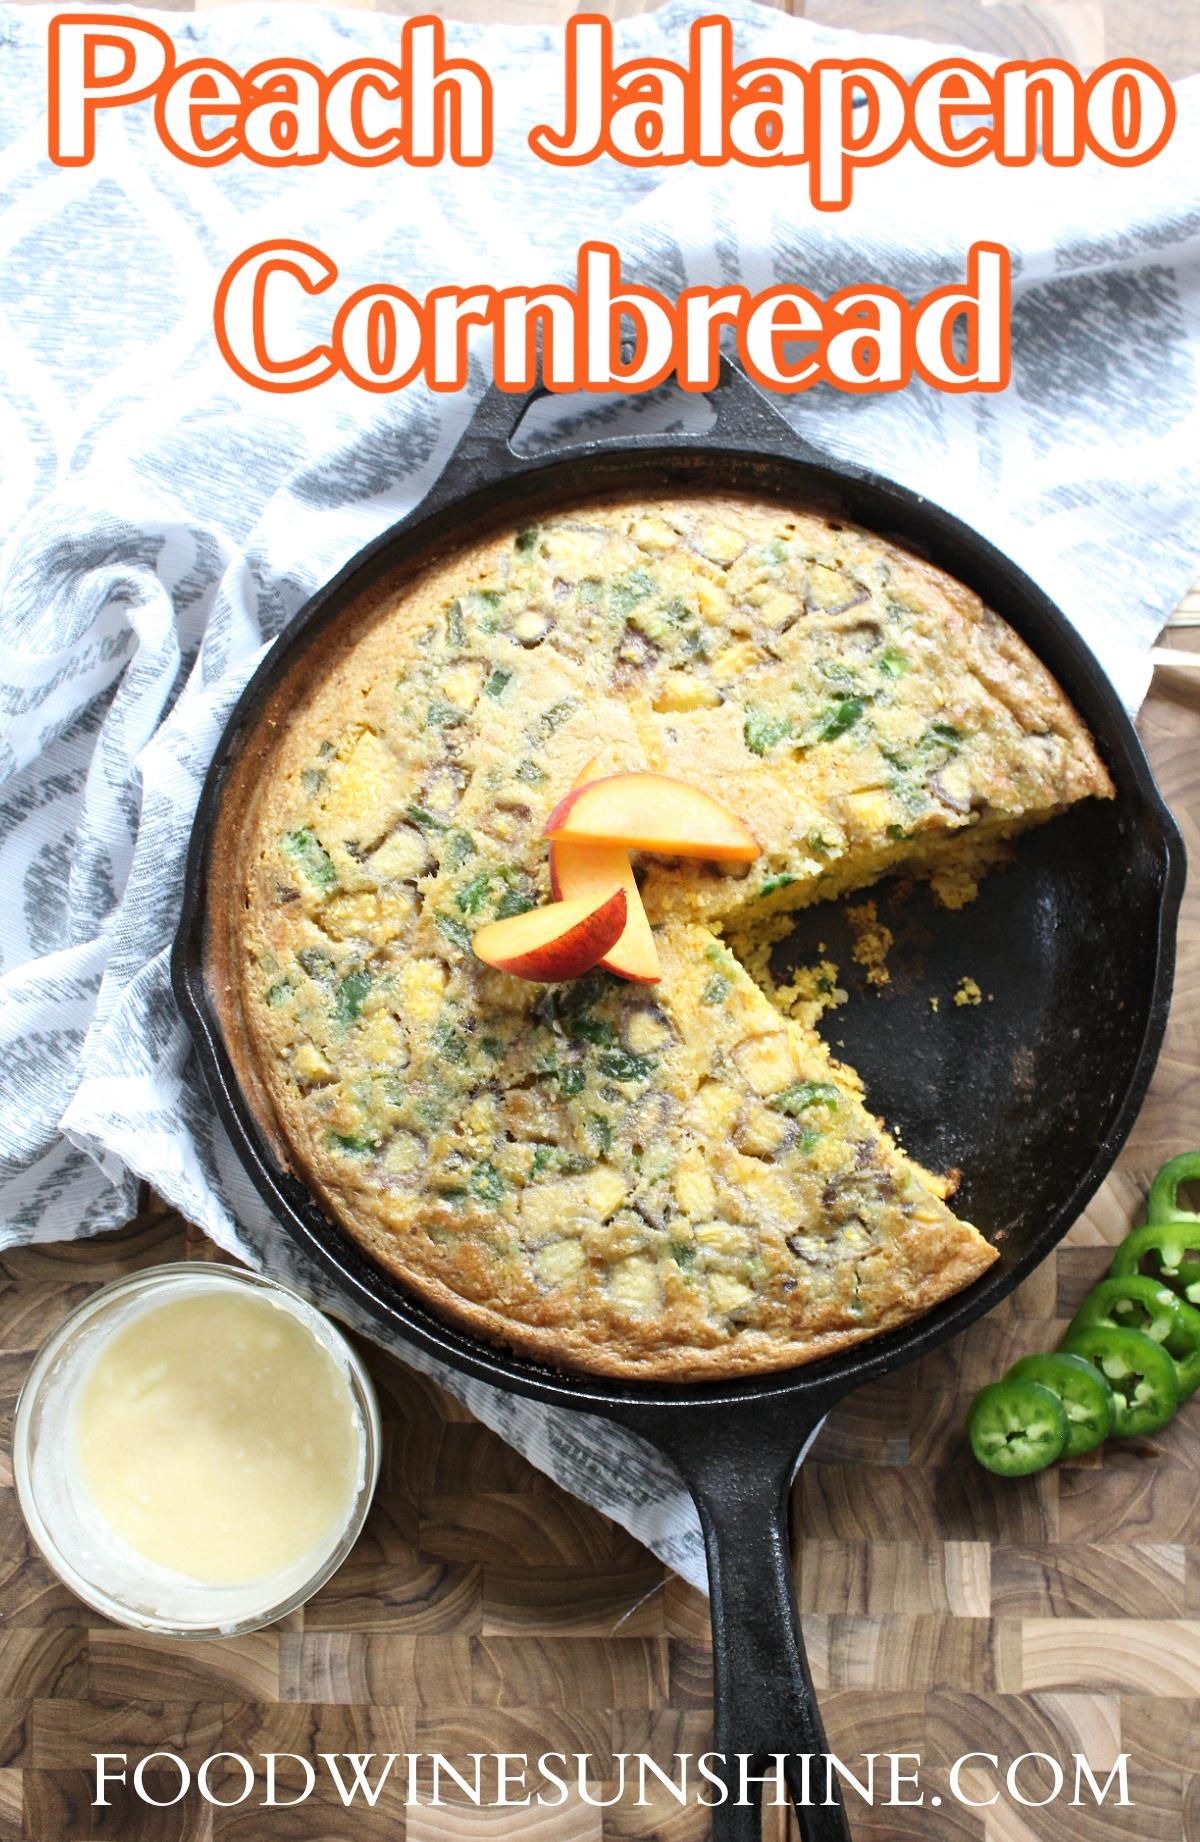 How to make the best Peach Jalapeno Cornbread